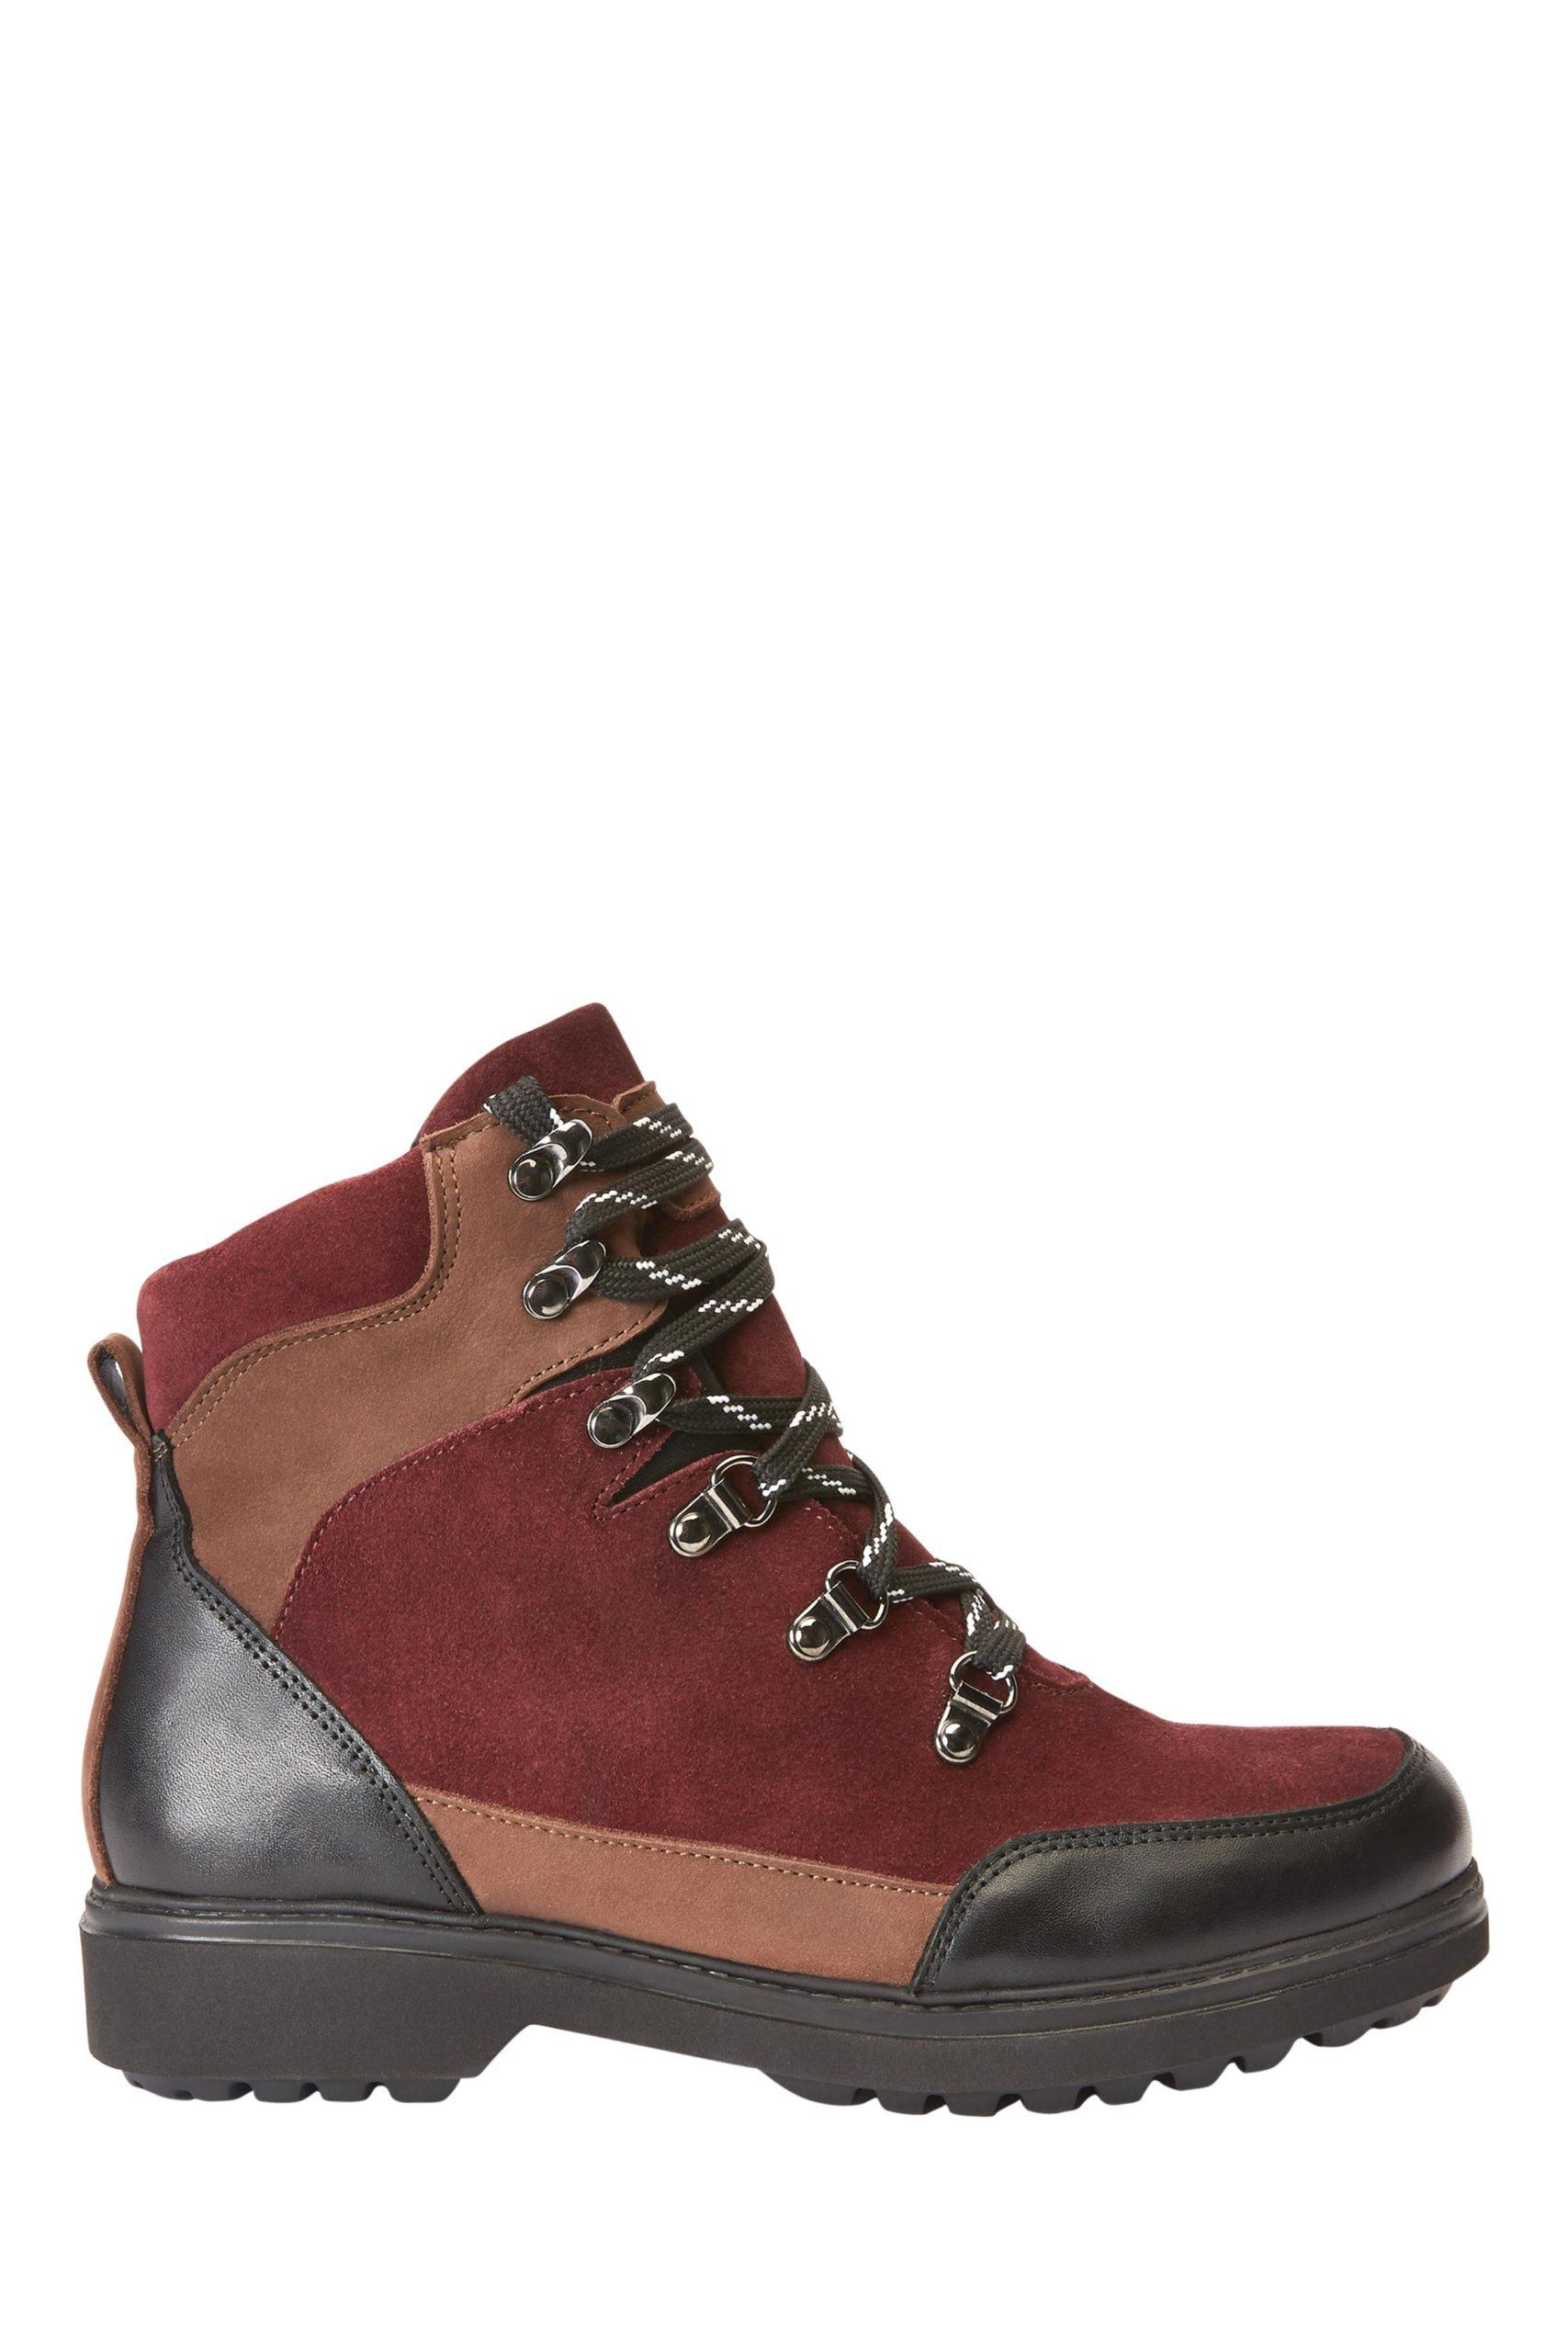 Walking boots, £100, Next